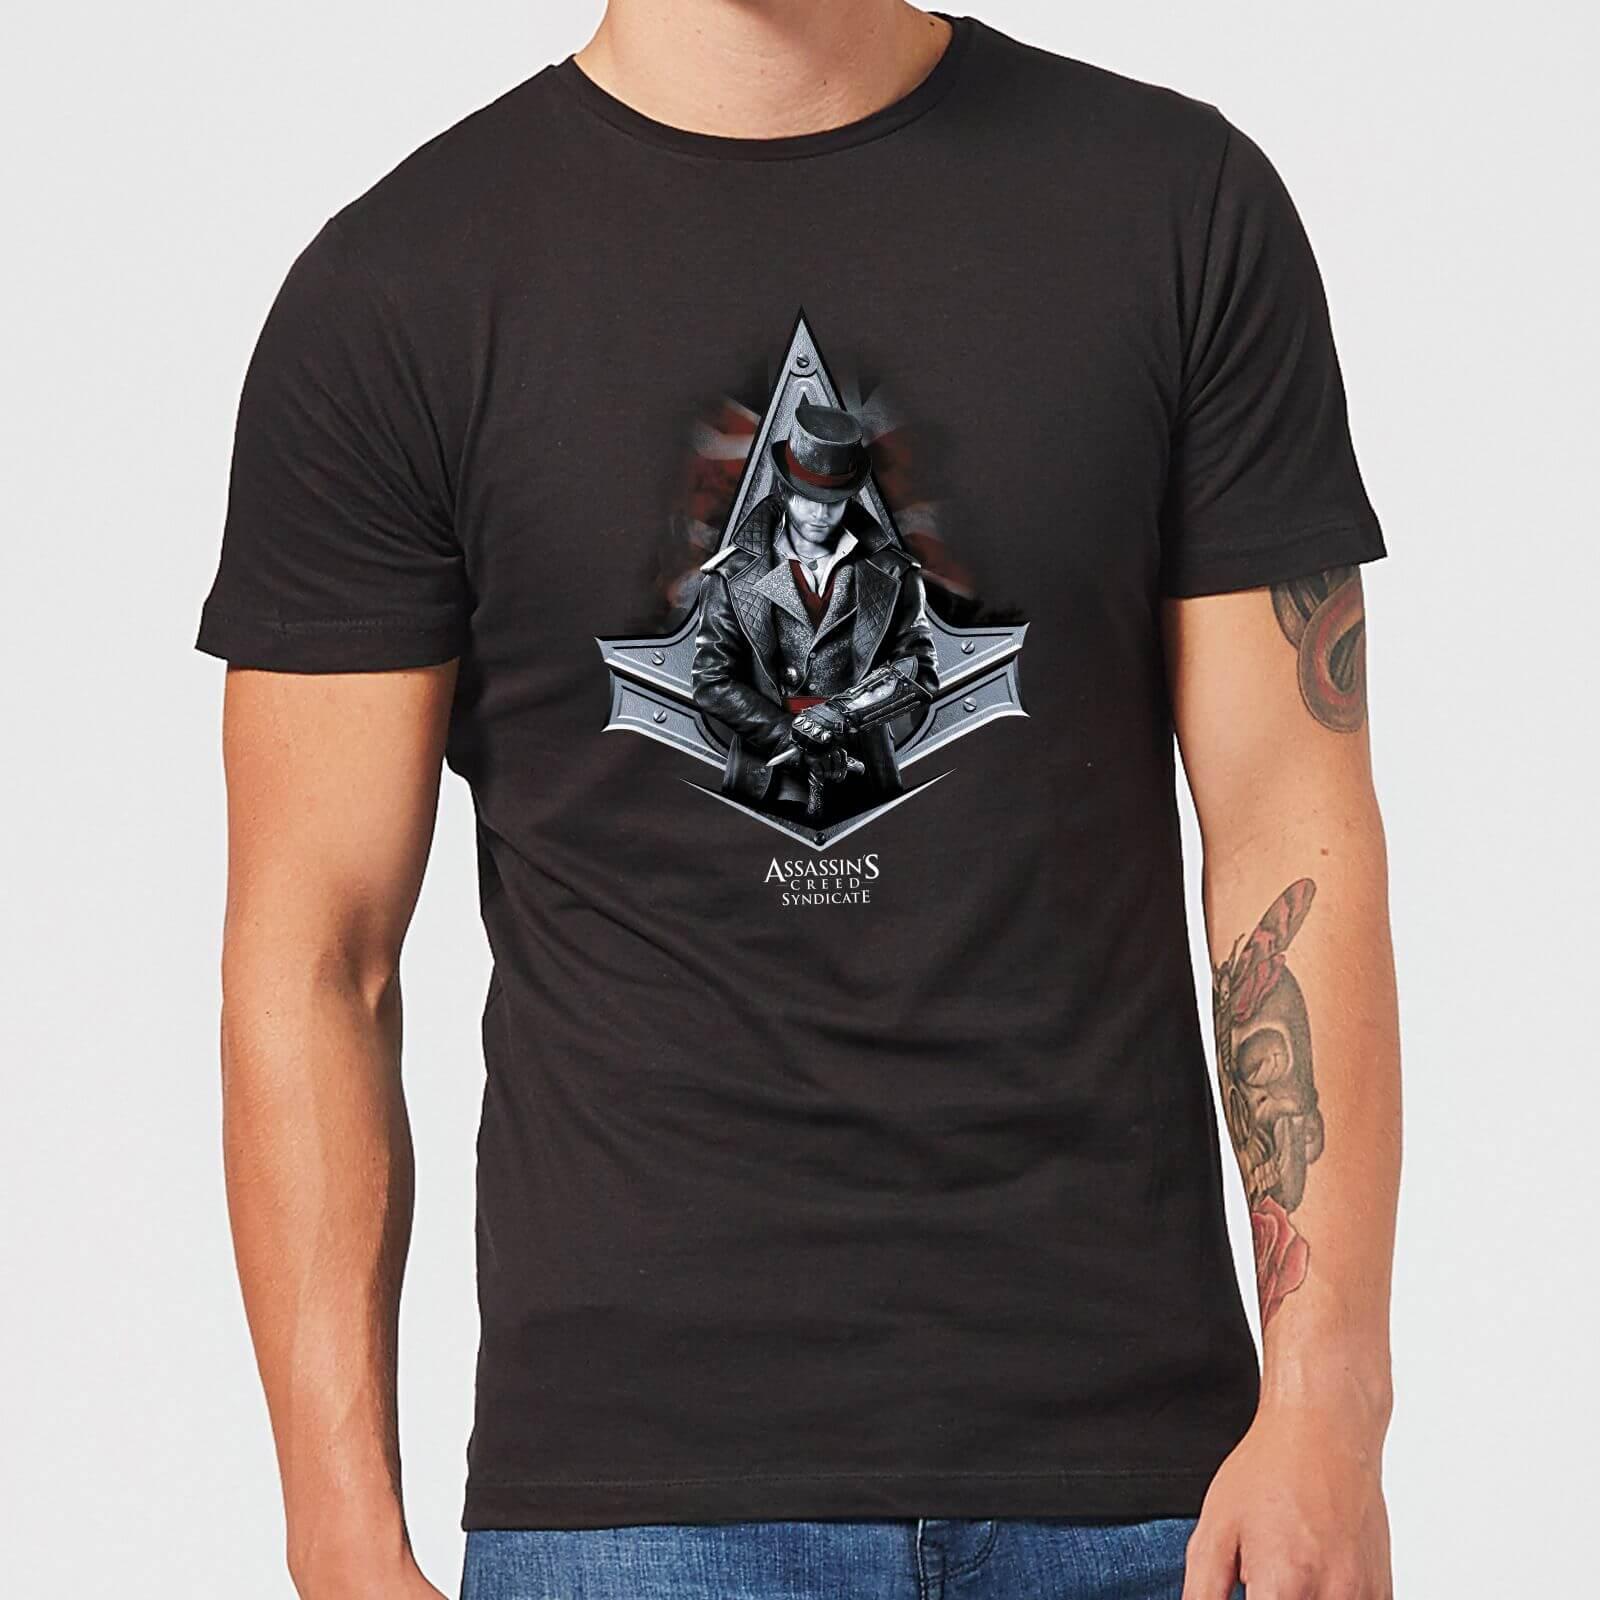 Assassin's Creed T-Shirt Homme Jacob Assassin's Creed Syndicate - Noir - L - Noir